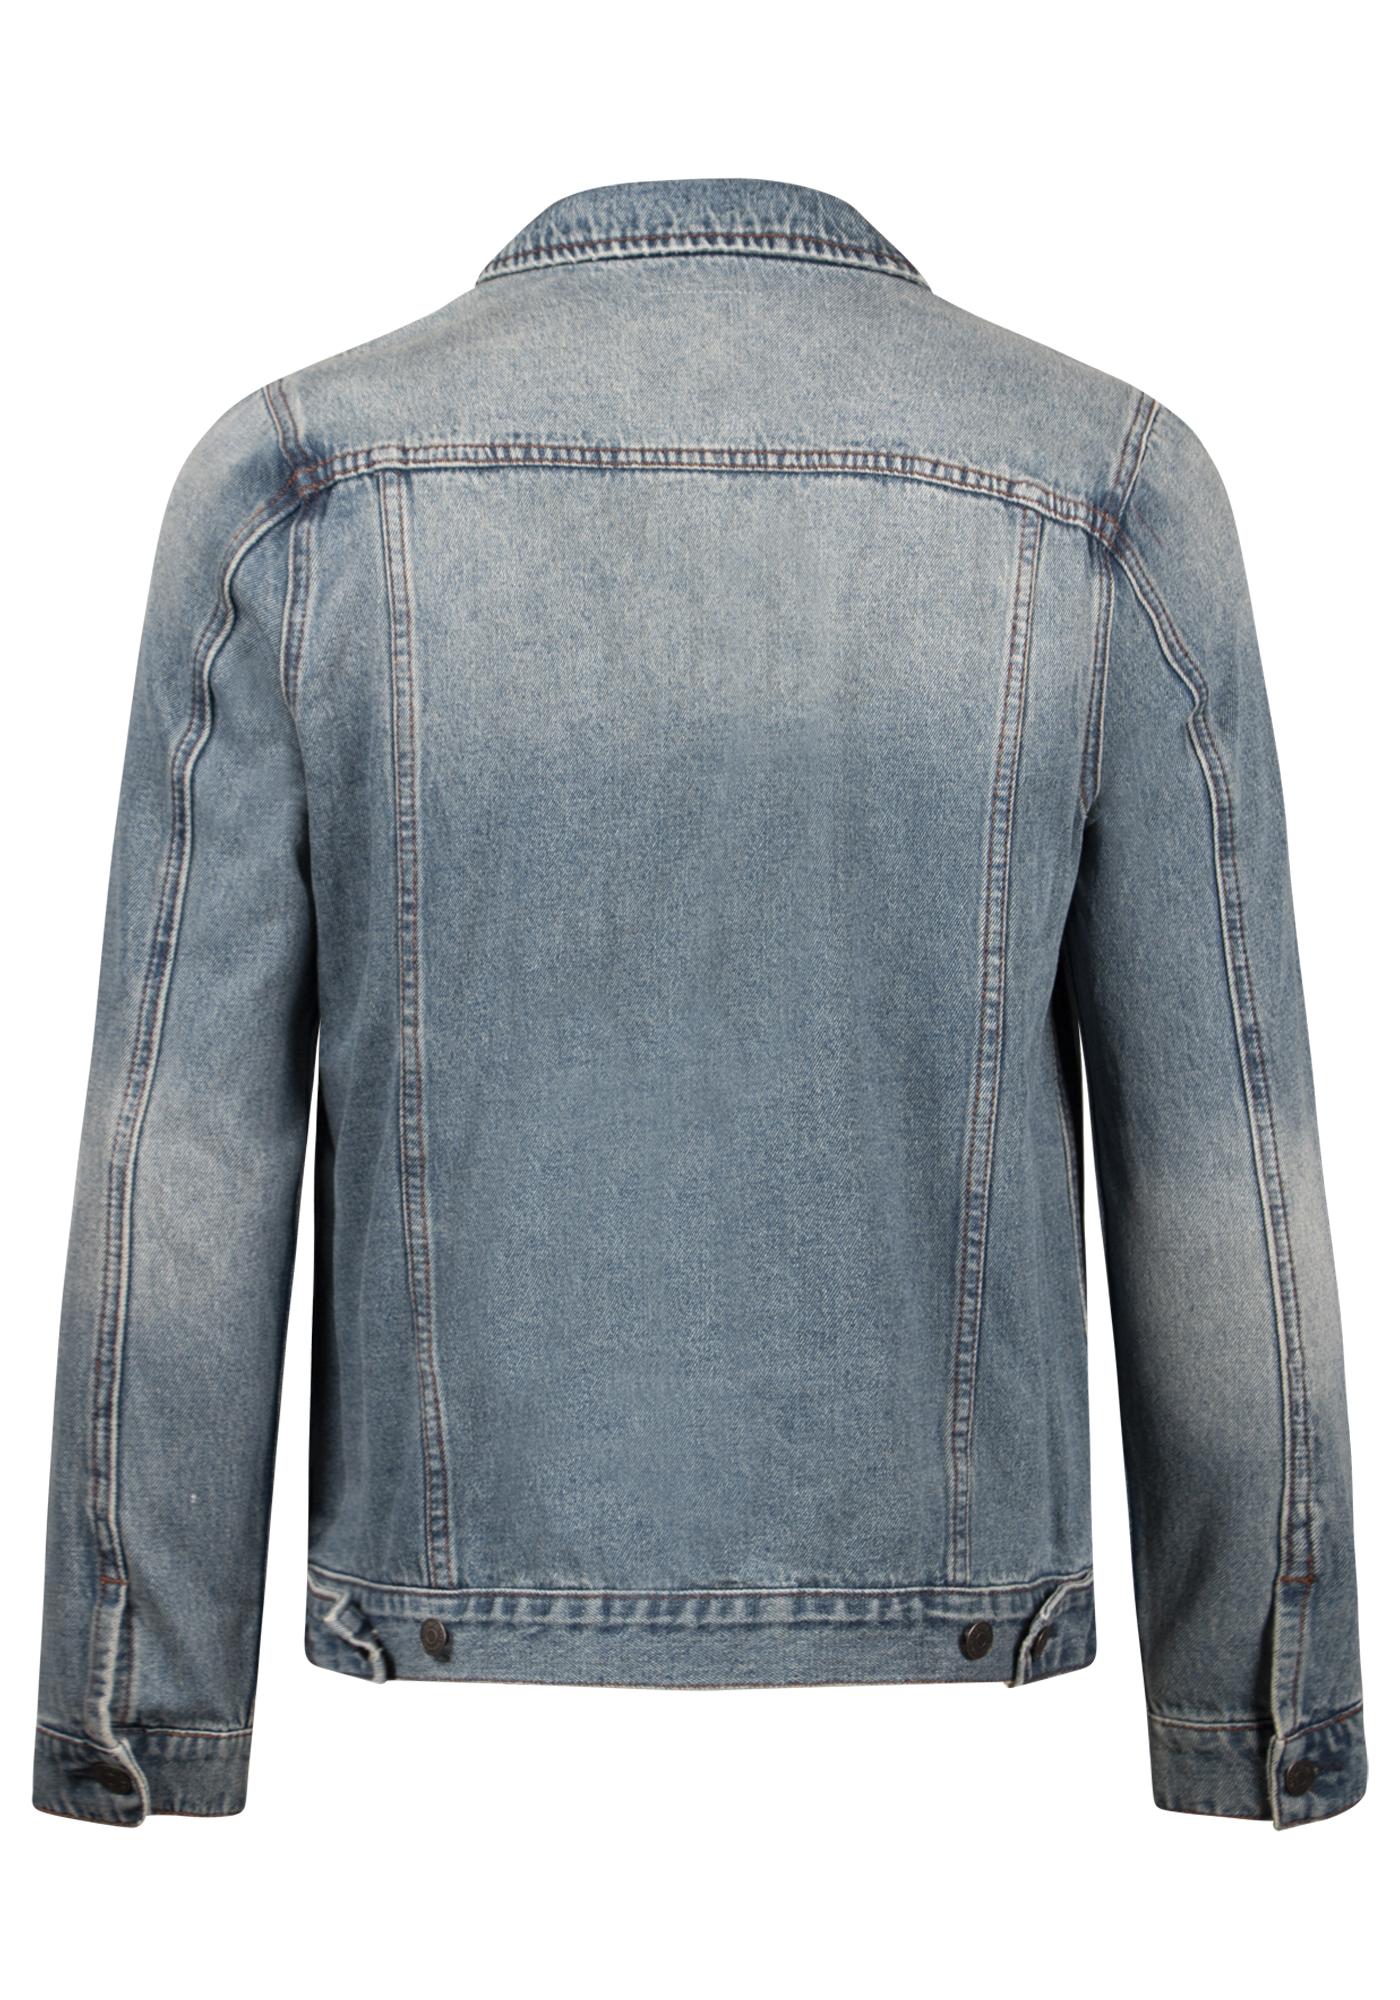 49bc2ffb4 Men's Vintage Wash Denim Jacket | Warehouse One